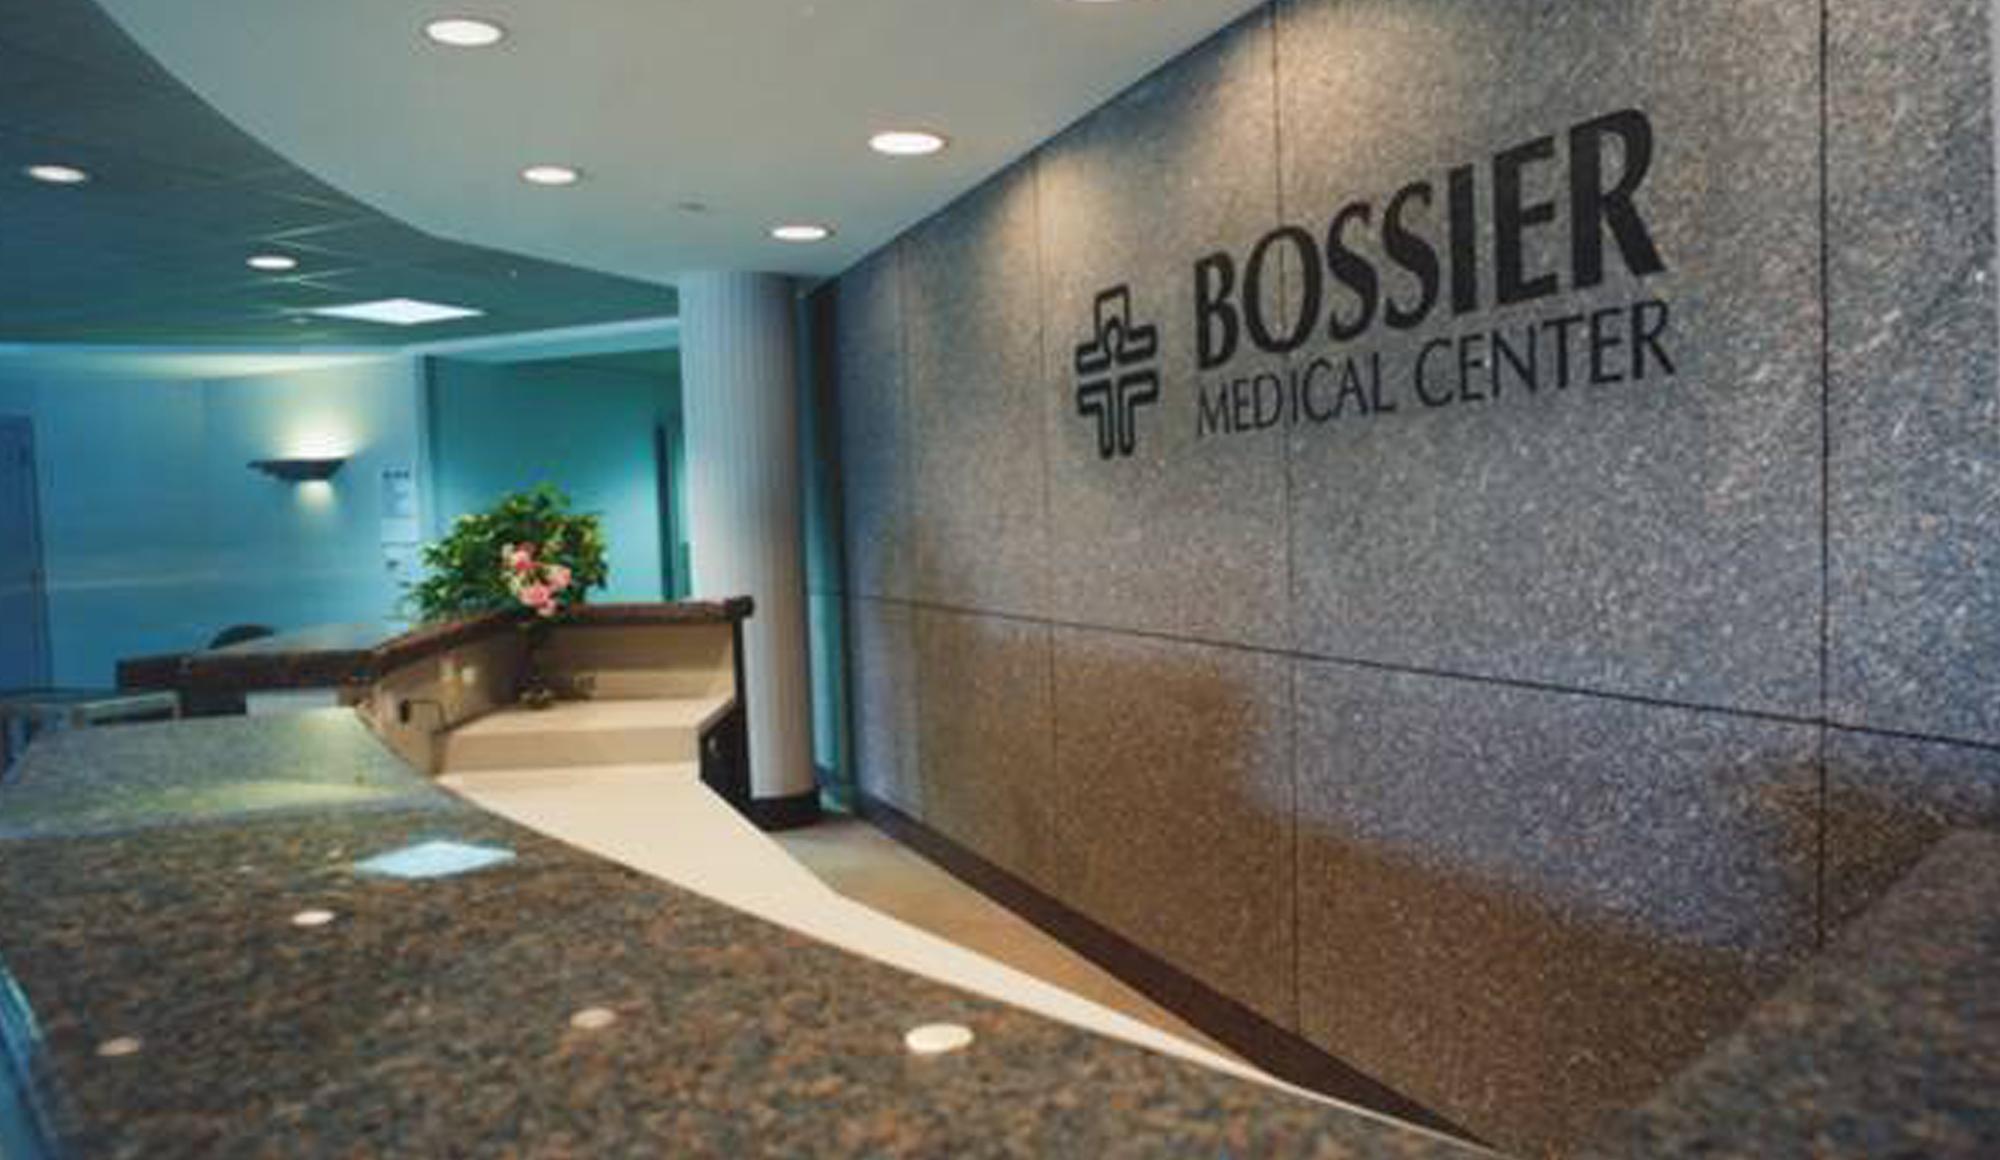 Bossier Medical Center